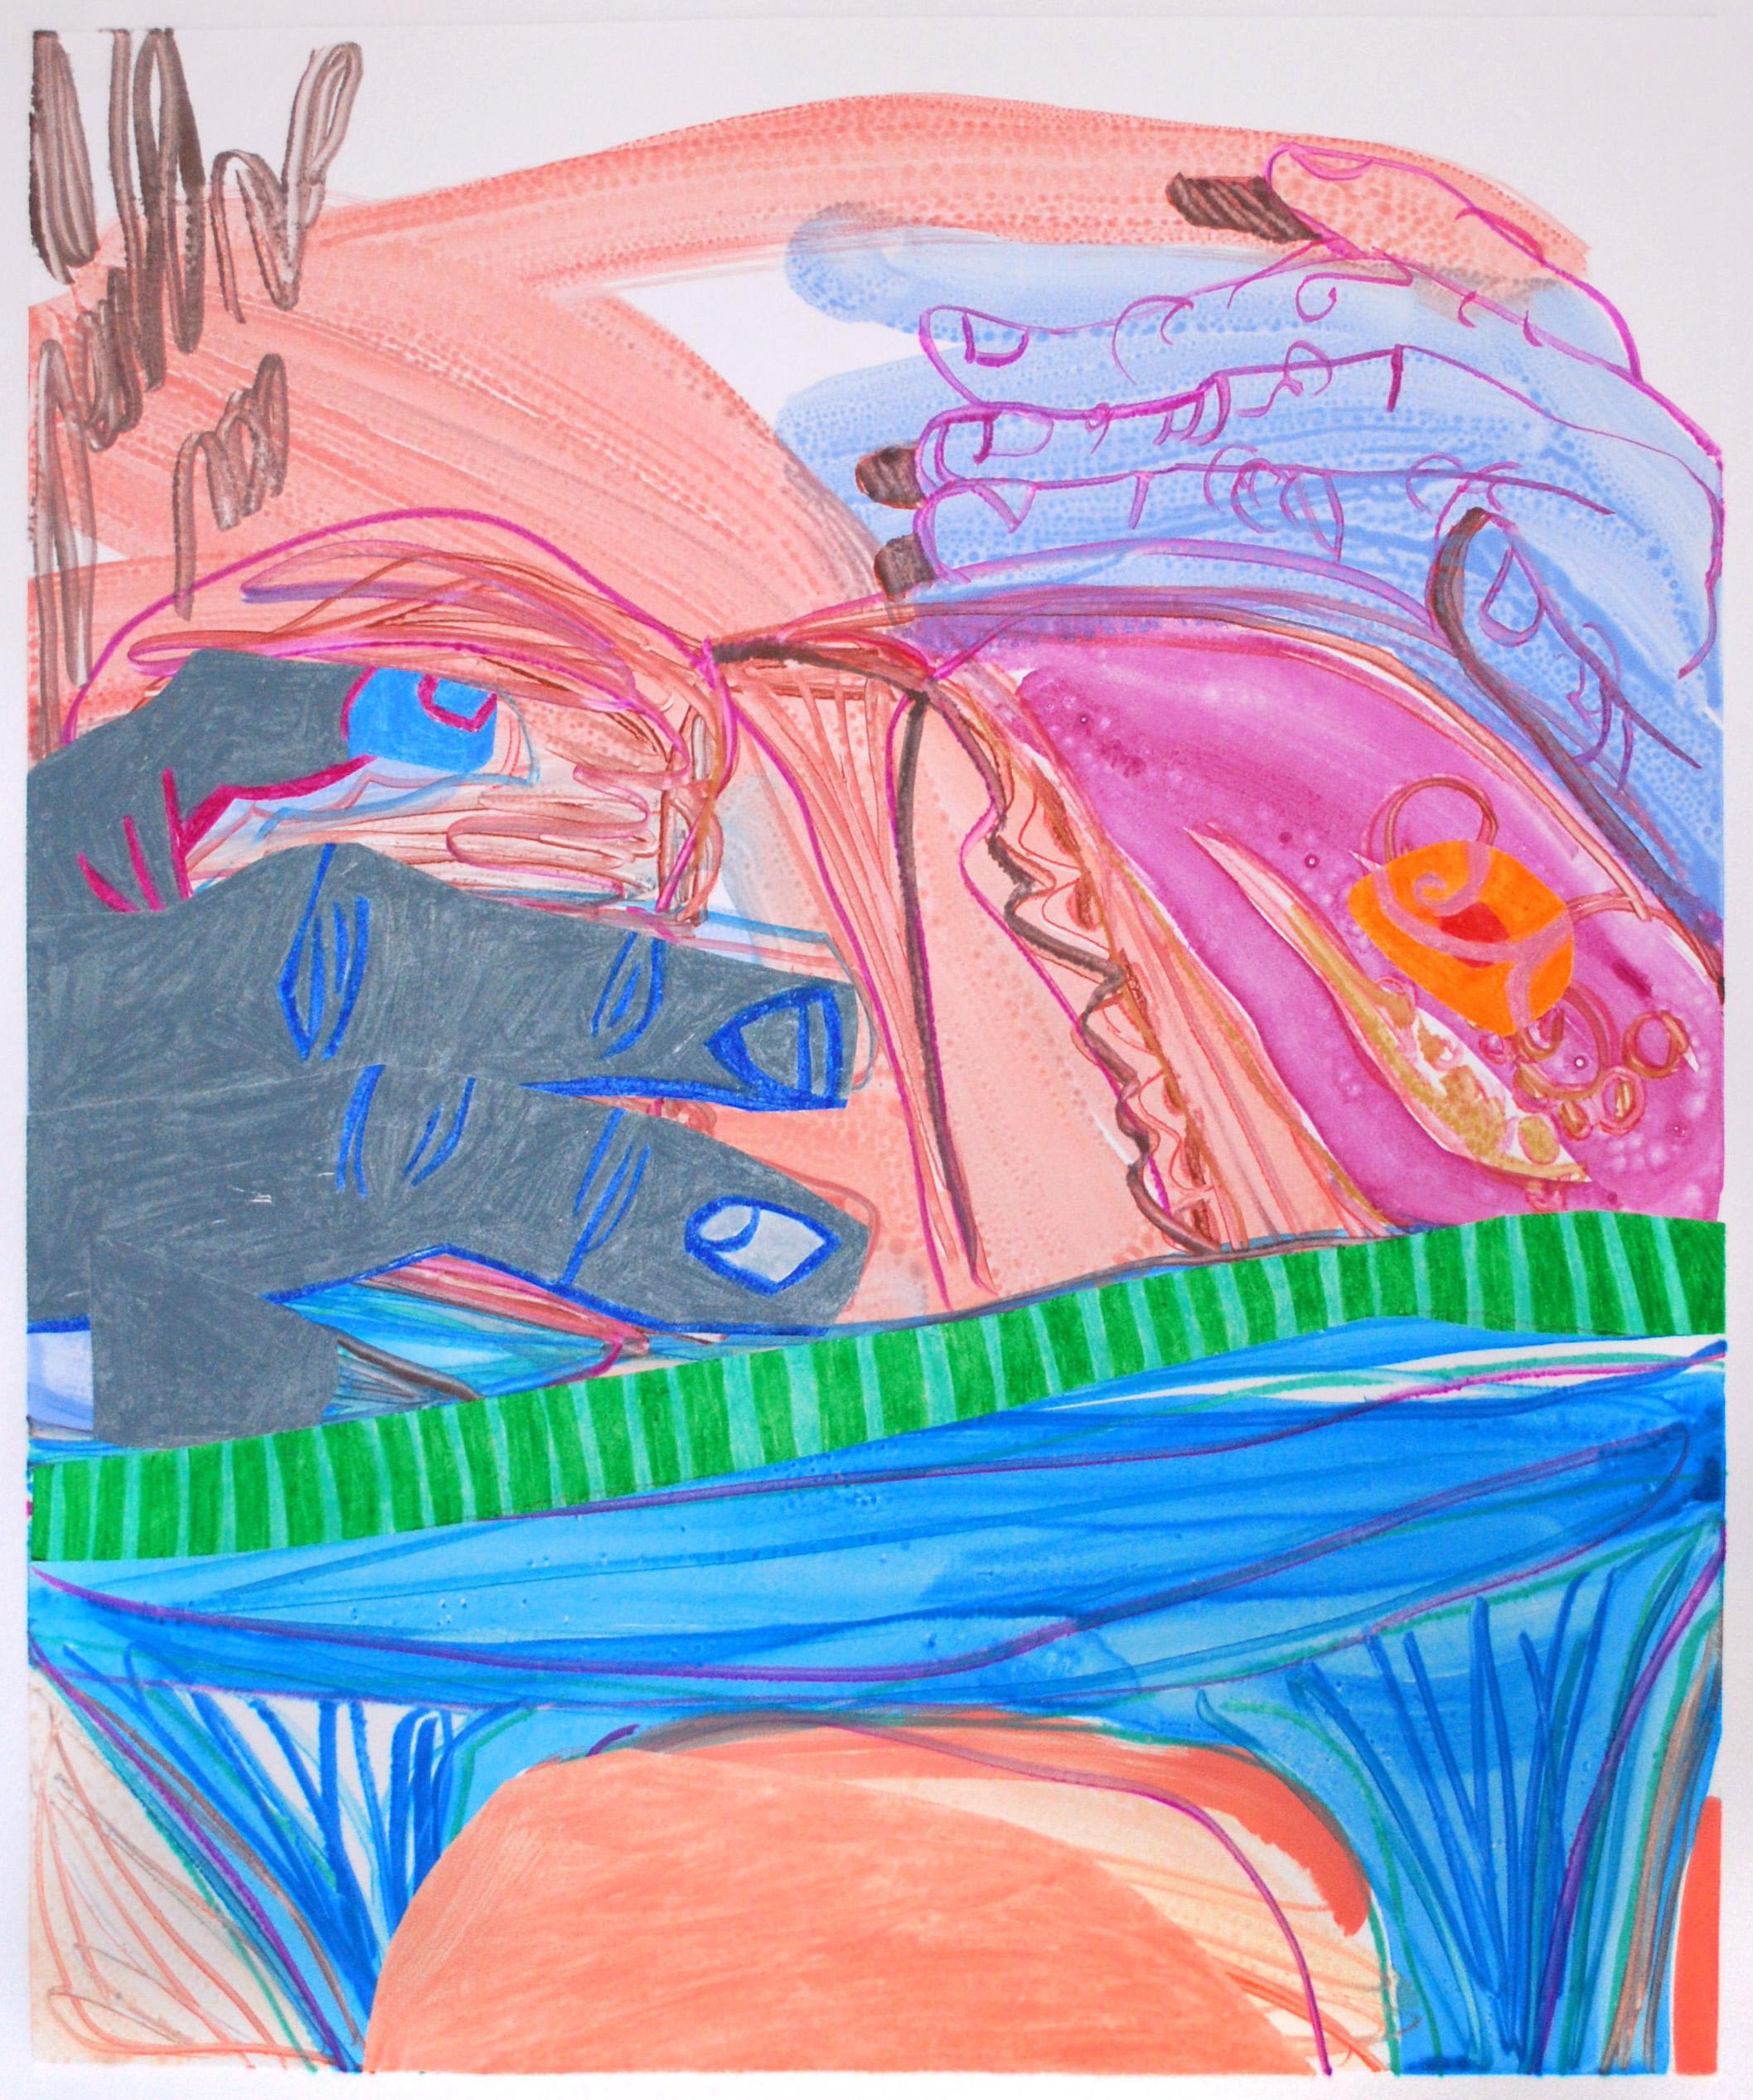 Sarah Faux Untitled Multicolor Monotype